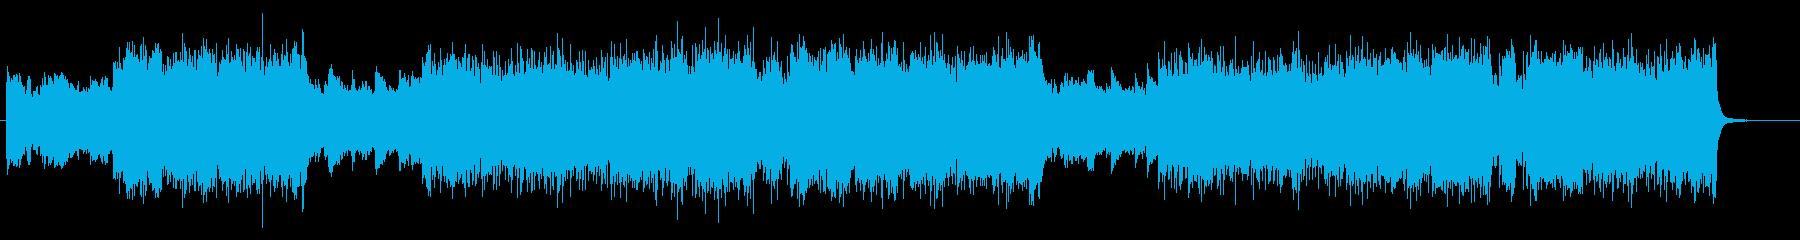 HEAVYROCK・DARK 283の再生済みの波形